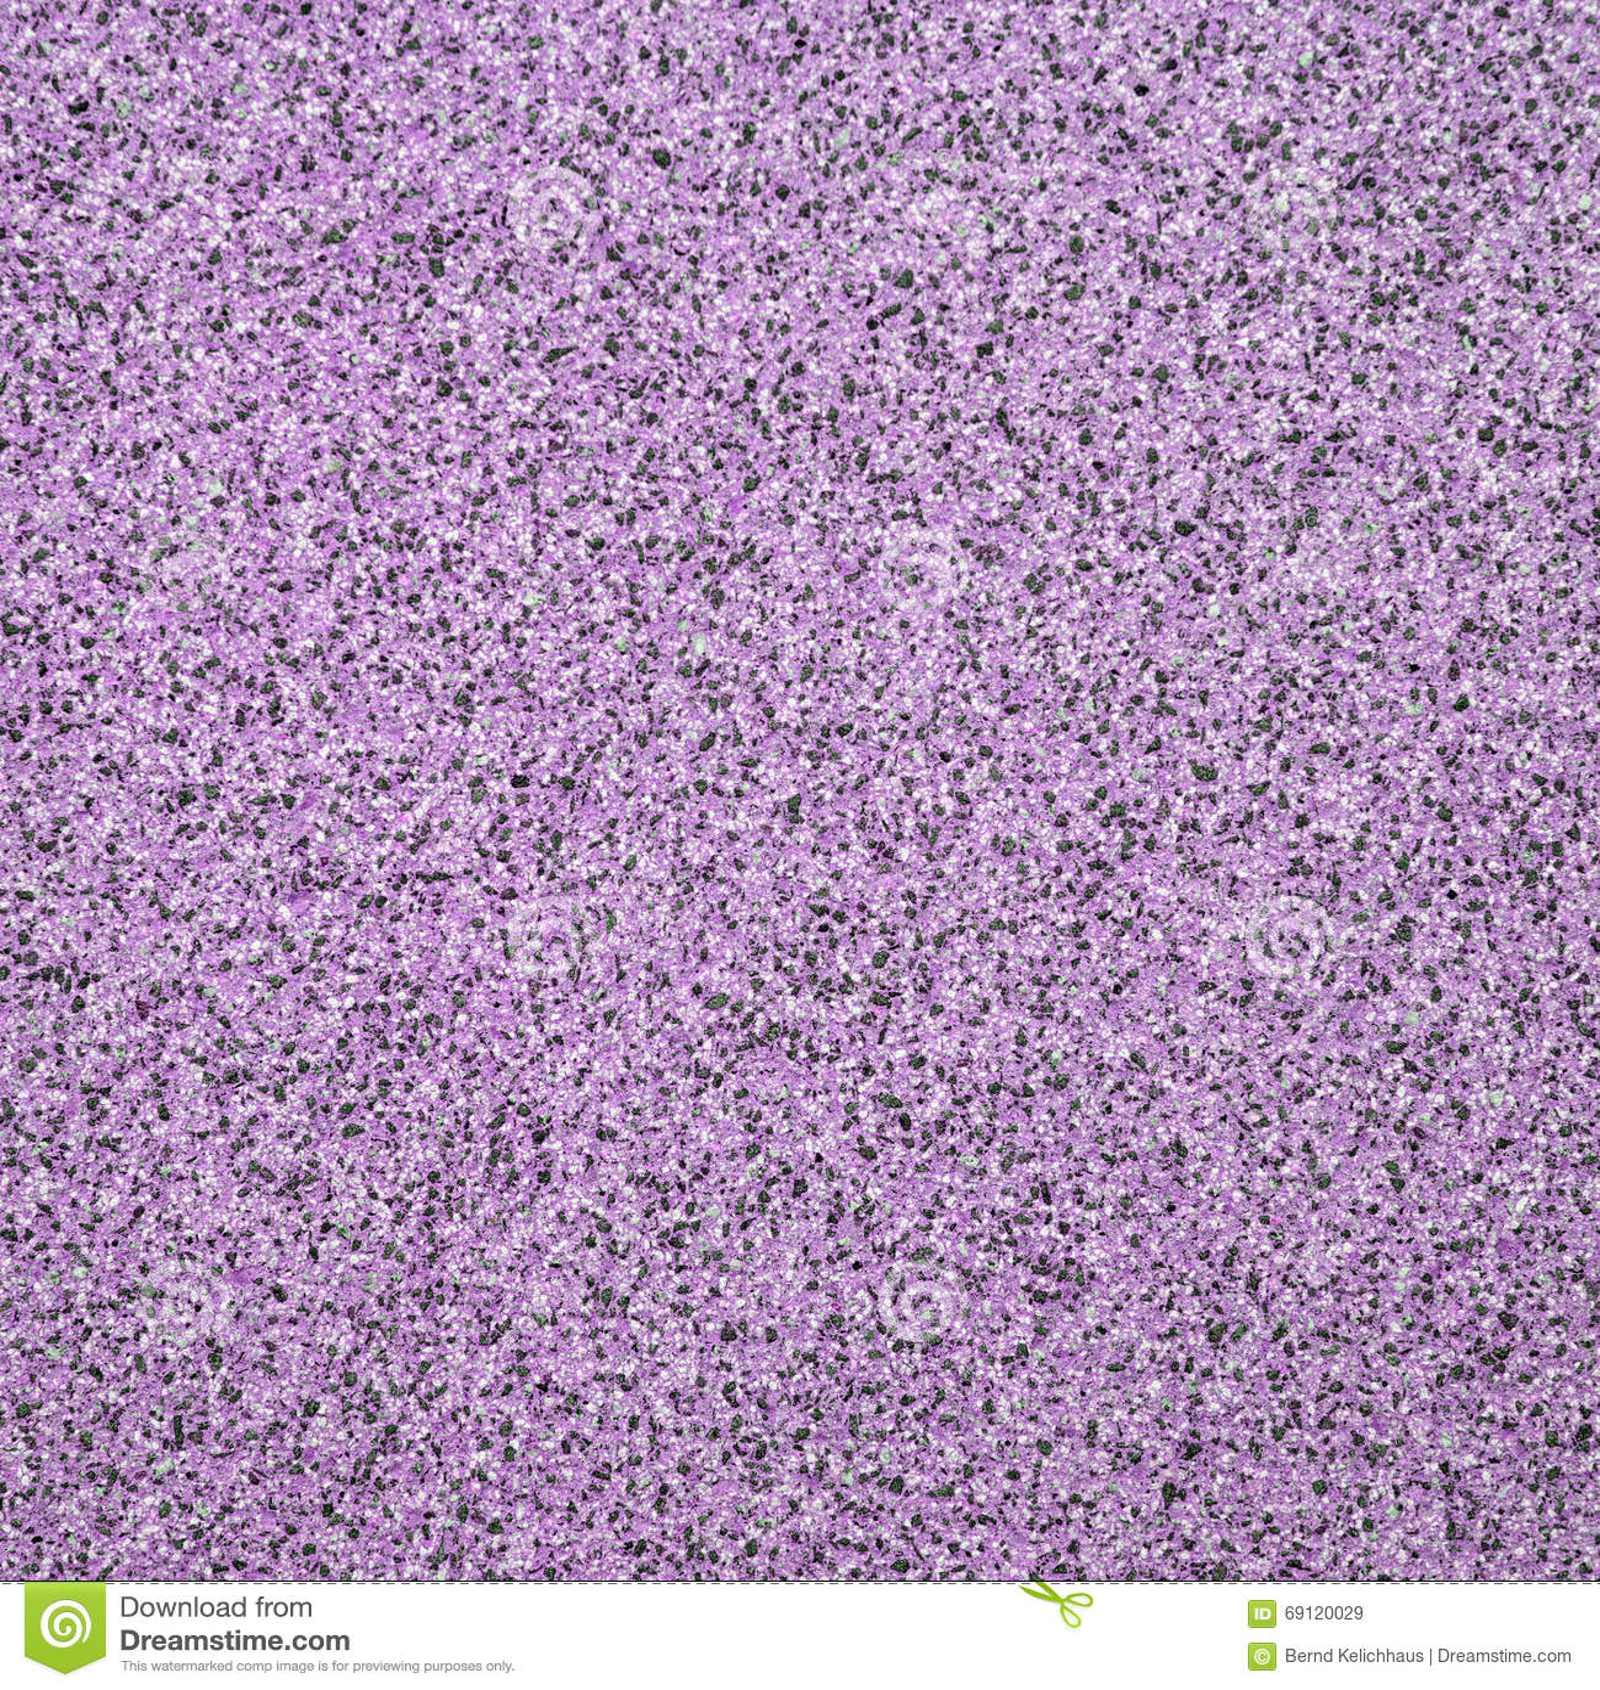 Purple Granite Stone : Granite texture purple stone slab surface stock image